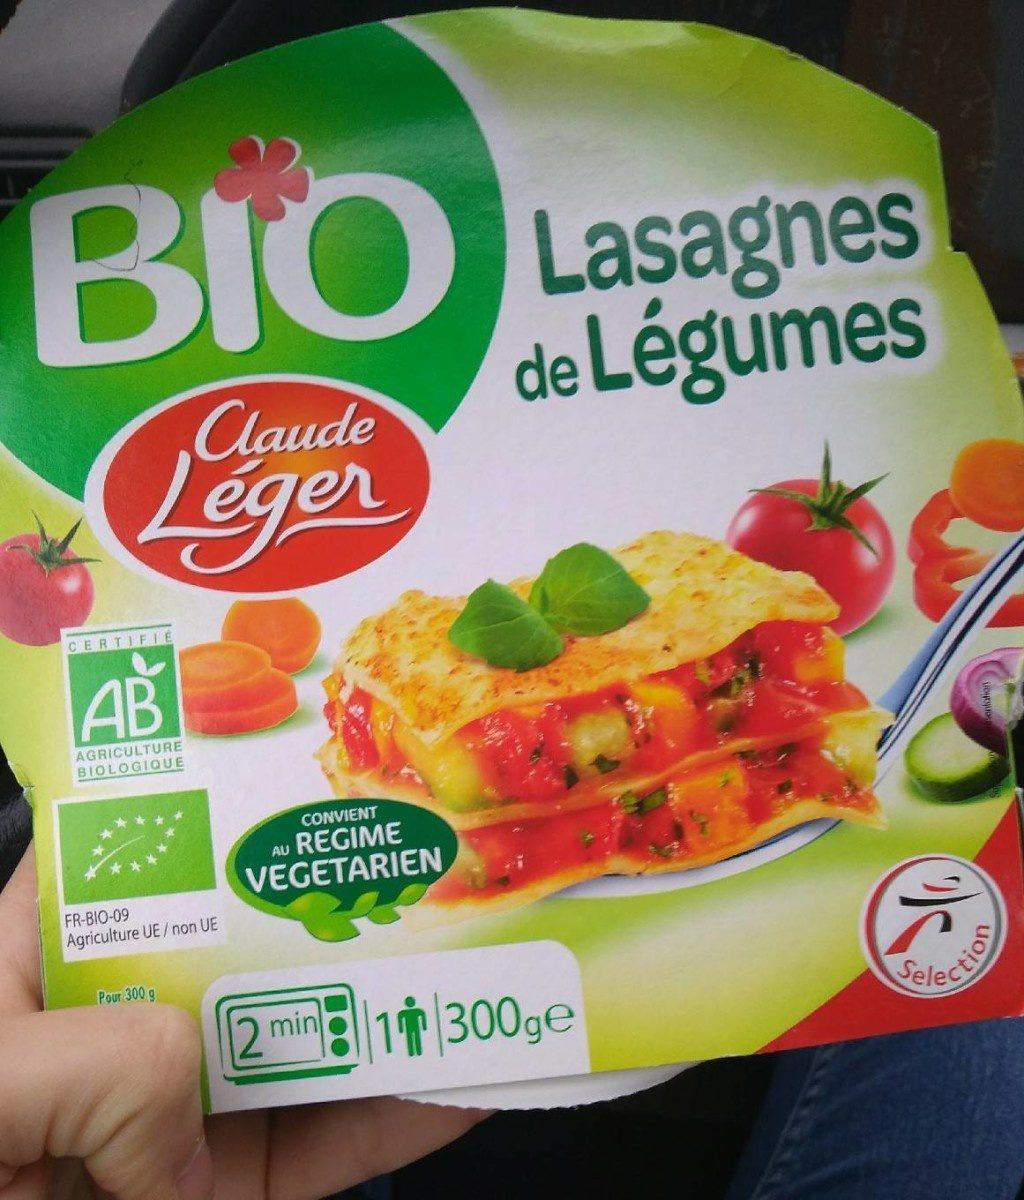 Lasagnes de legumes - Produit - fr